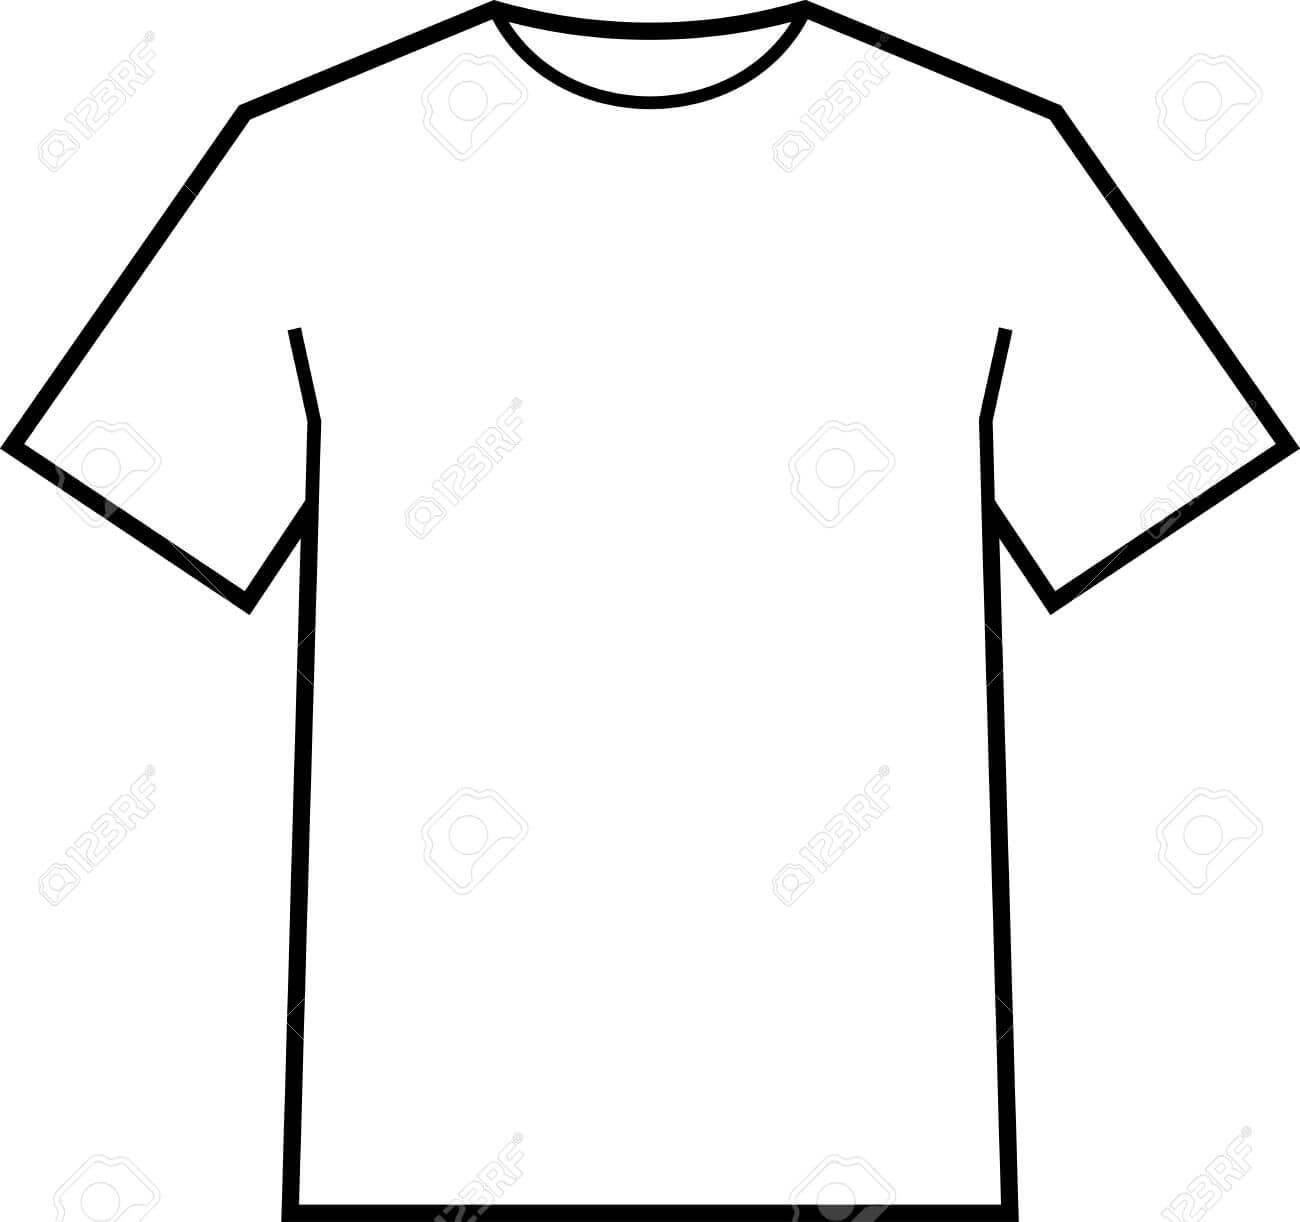 Blank T Shirt Template Vector In Blank Tee Shirt Template